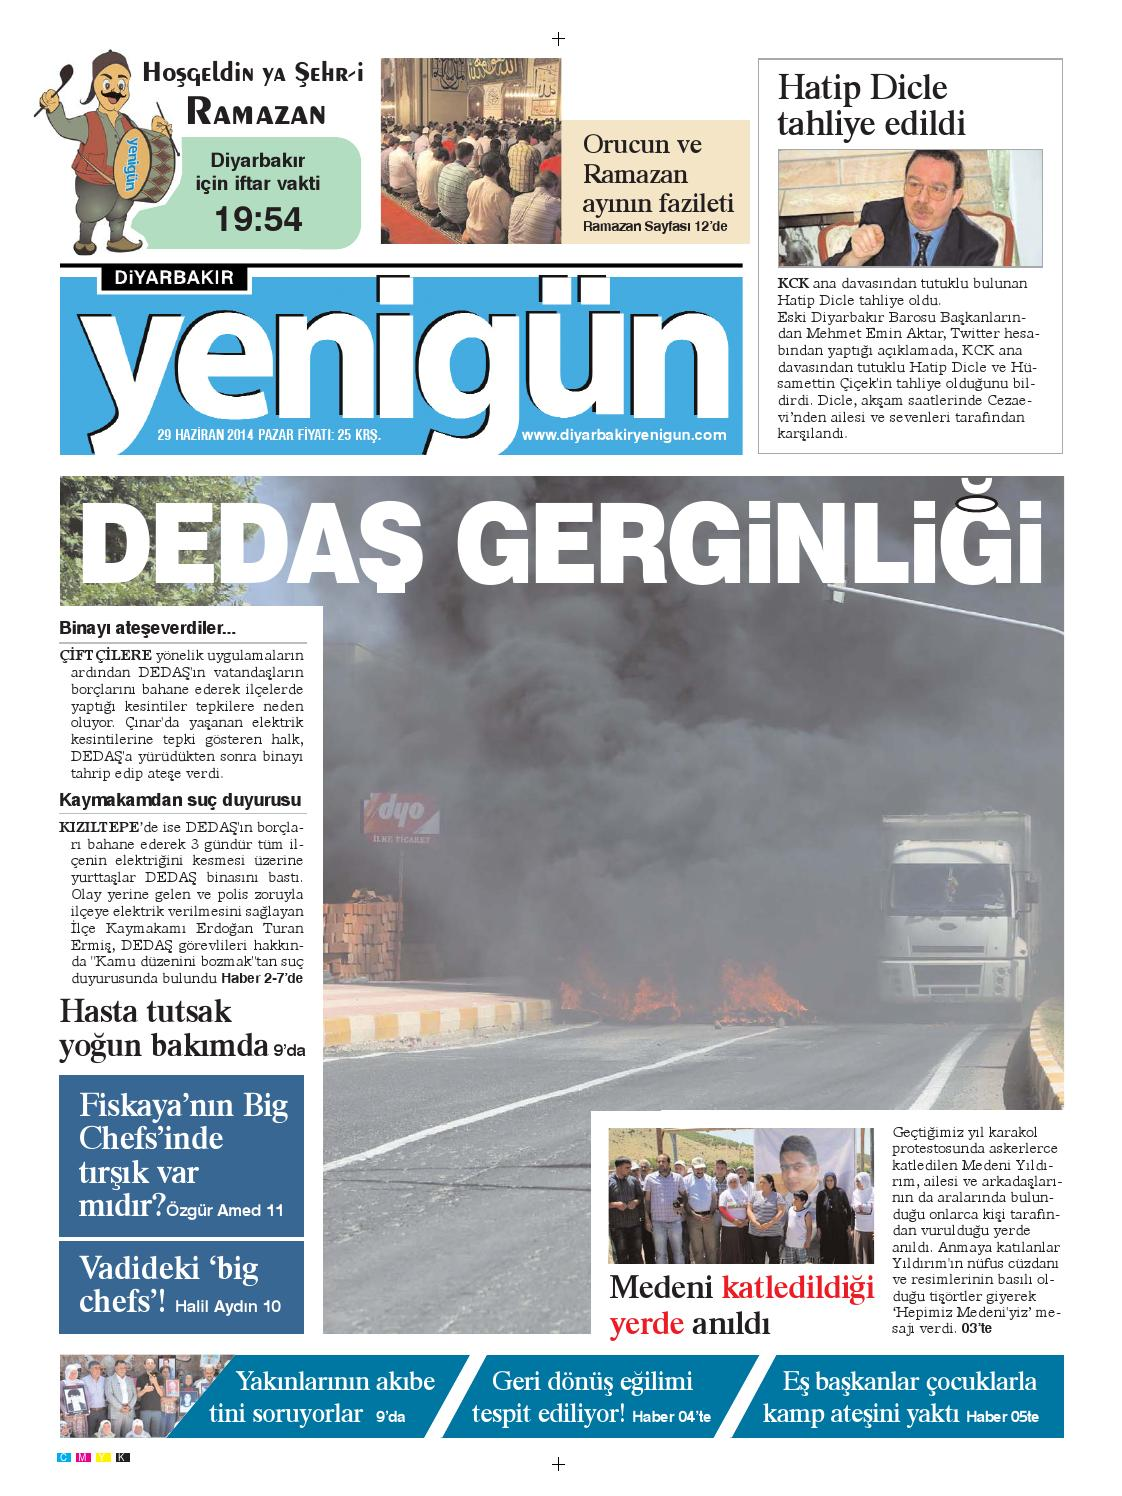 Diyarbakir Yenigun Gazetesi 29 Haziran 2014 By Osman Ergun Issuu